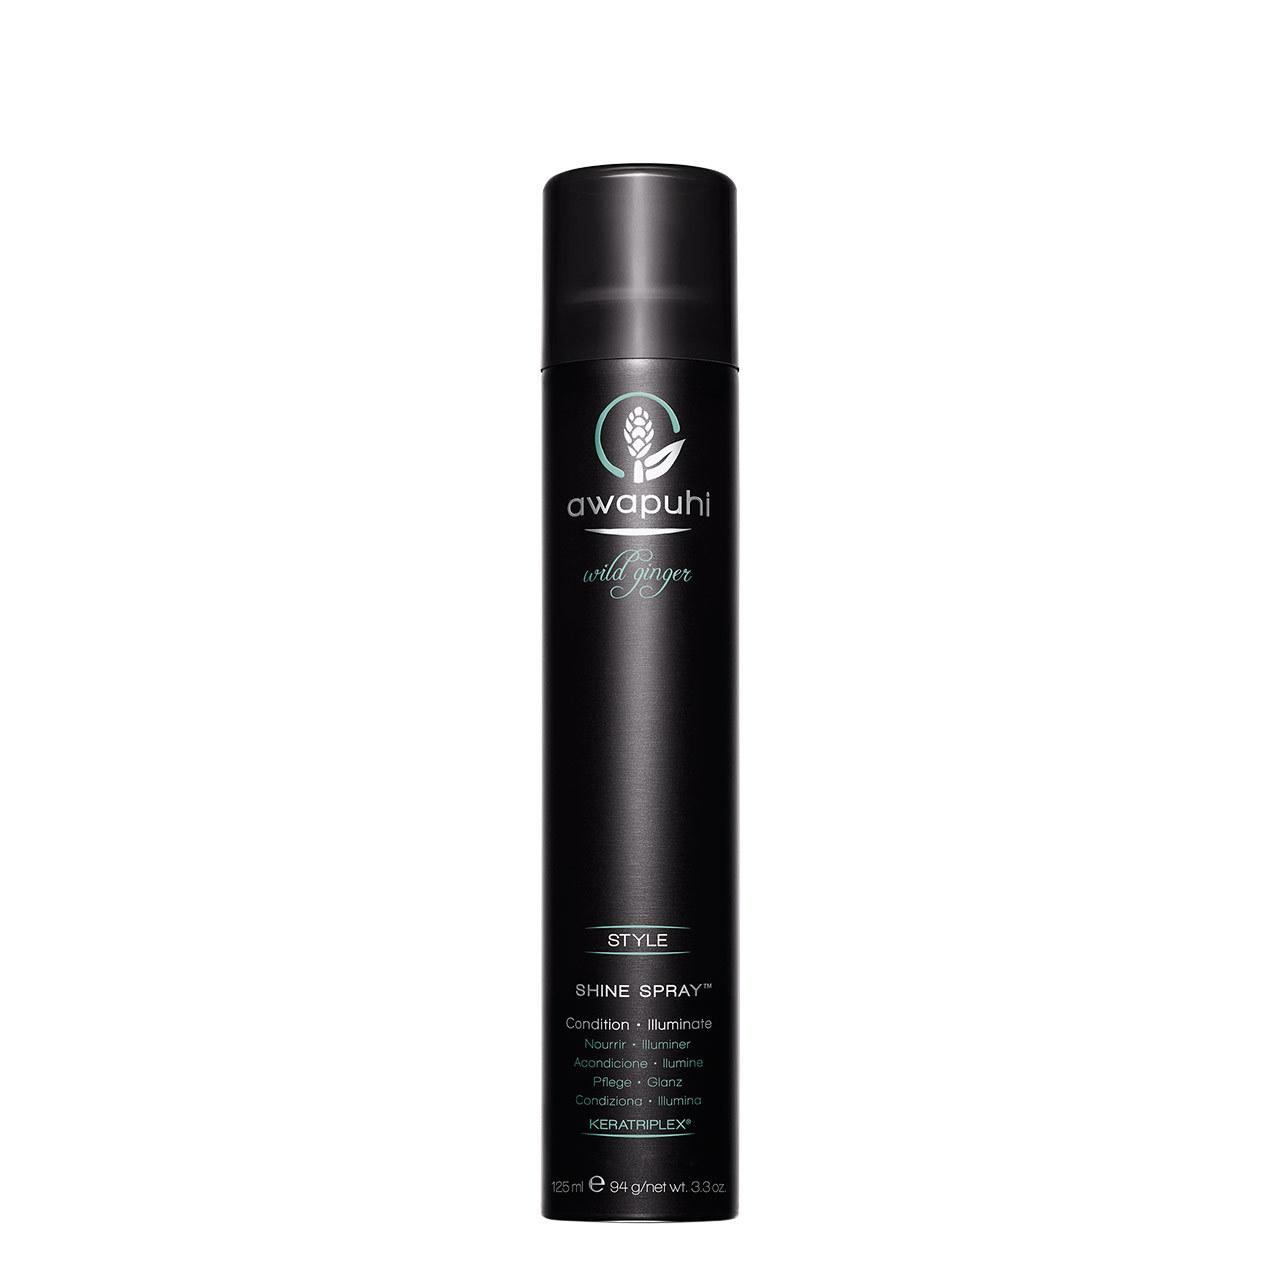 Awapuhi Wild Ginger Shine Spray™ 125ml